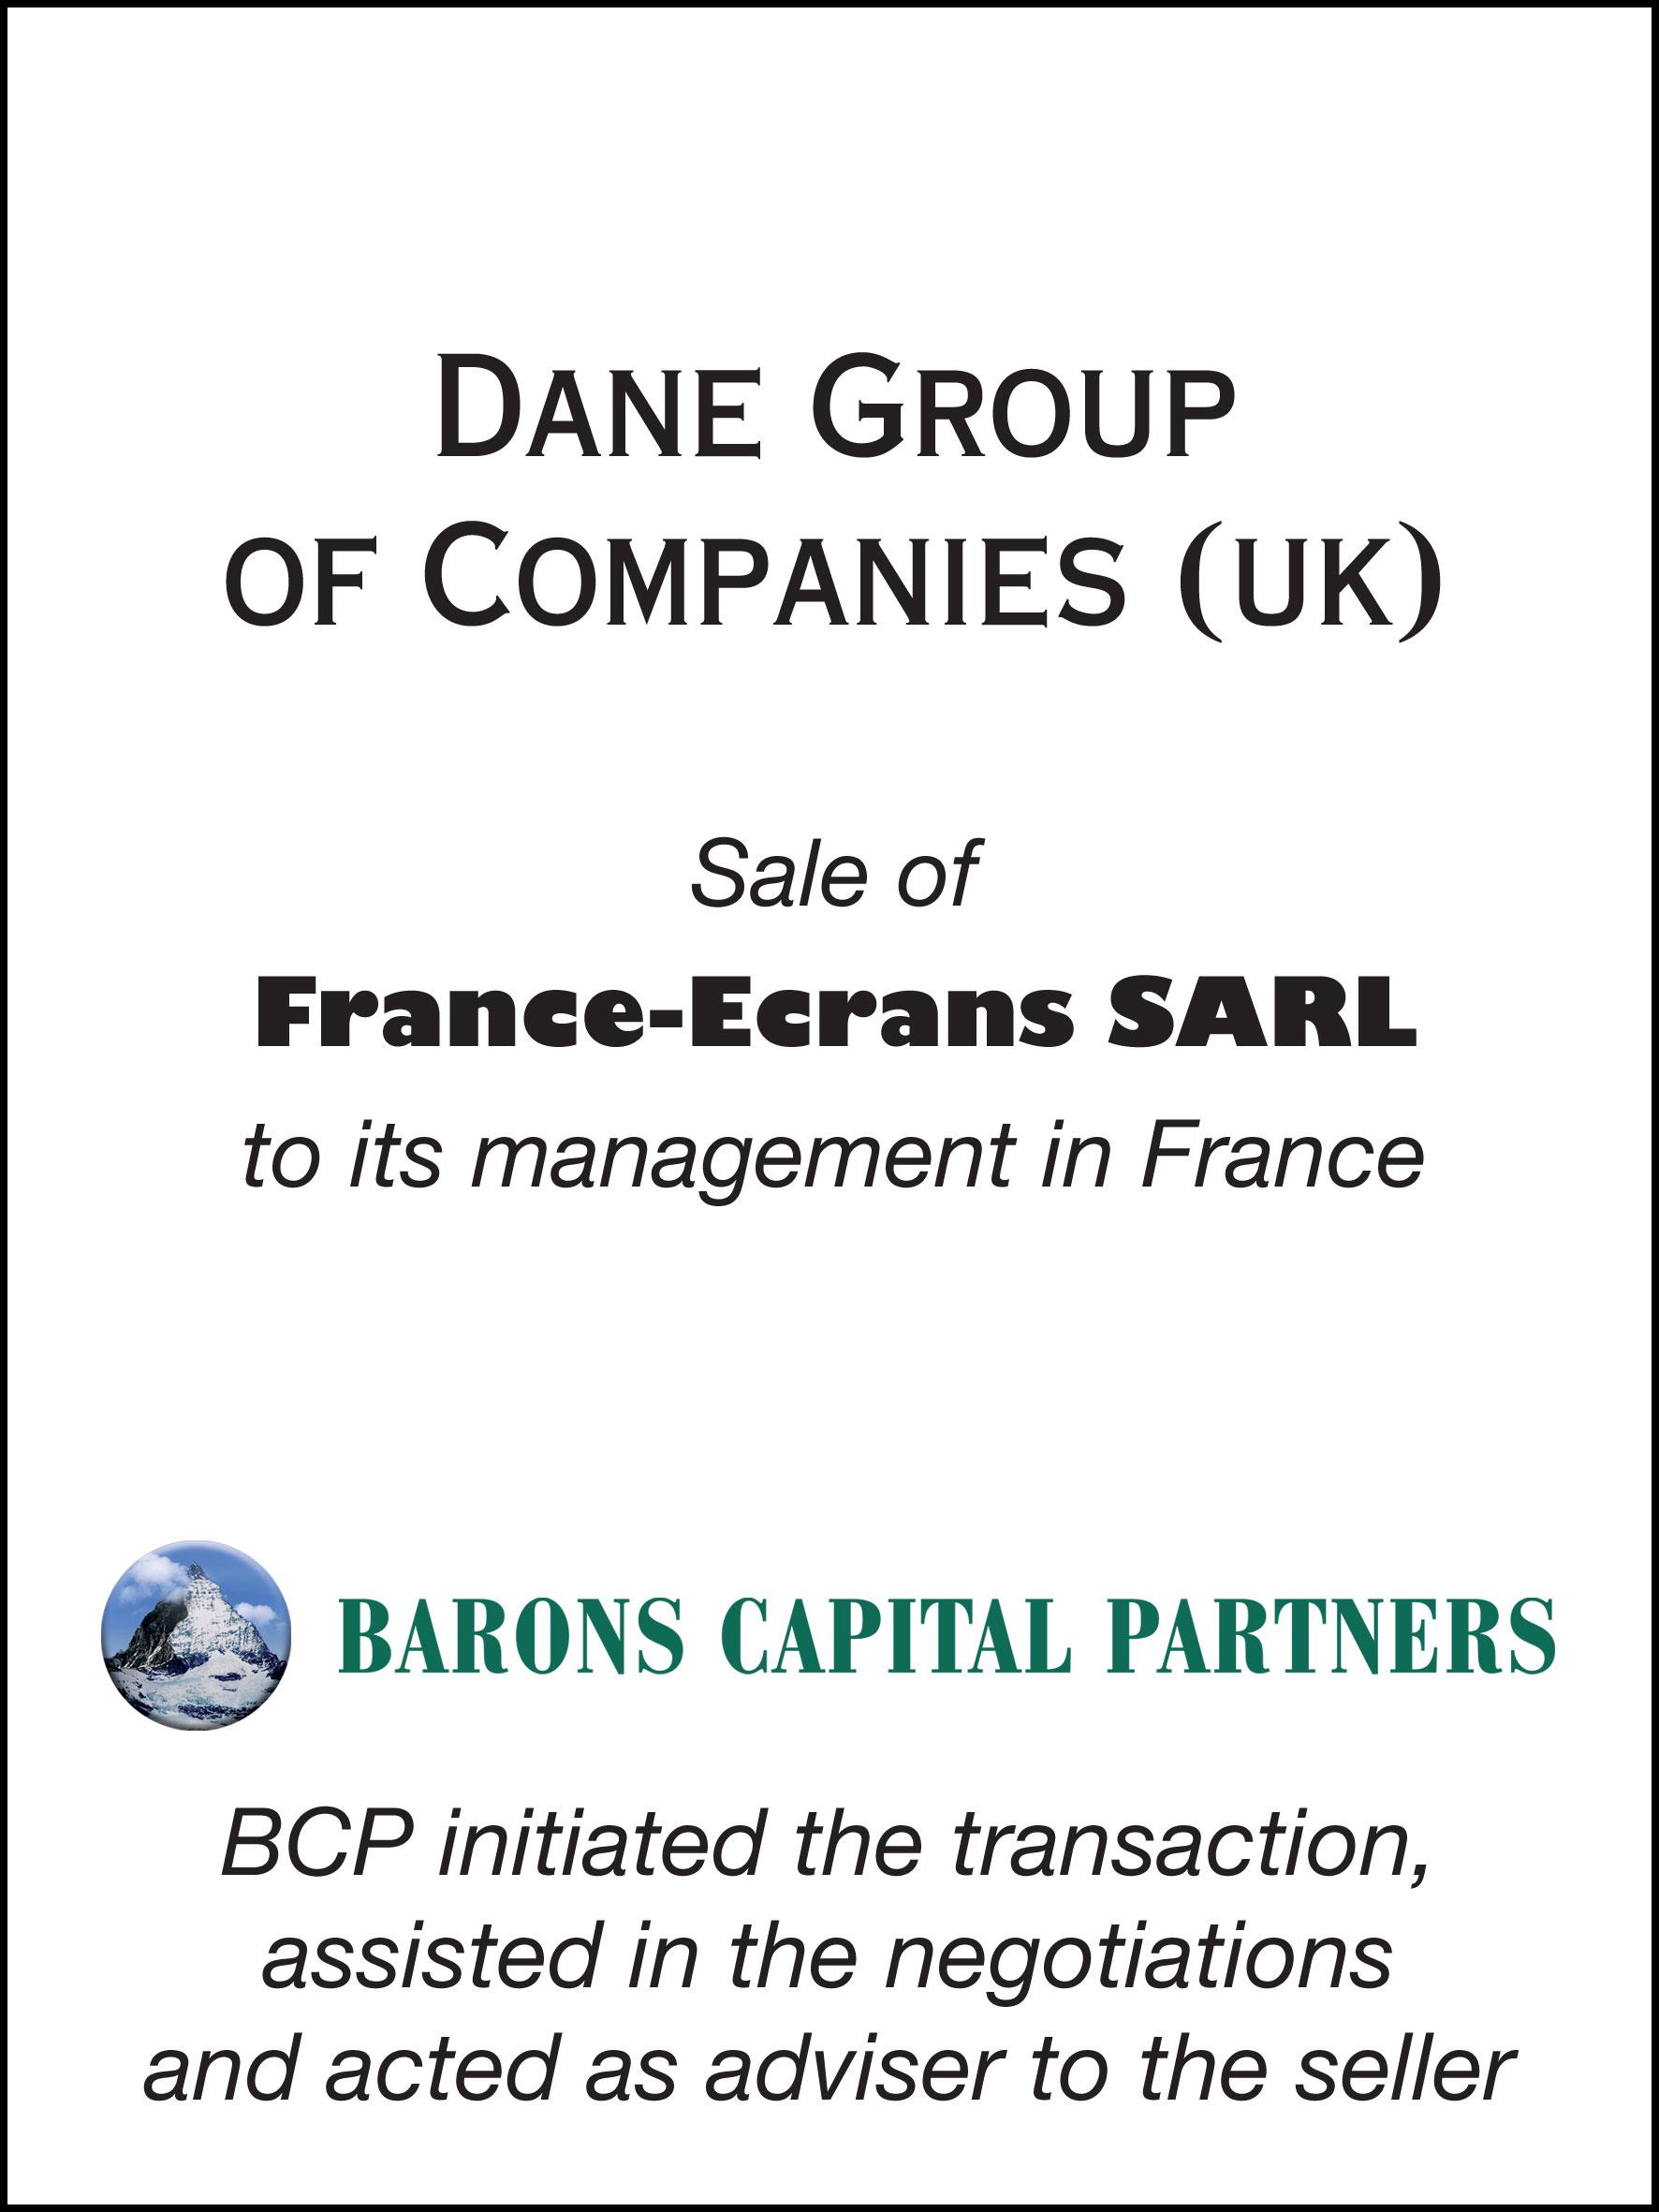 24_Dane Group of Companies (UK)